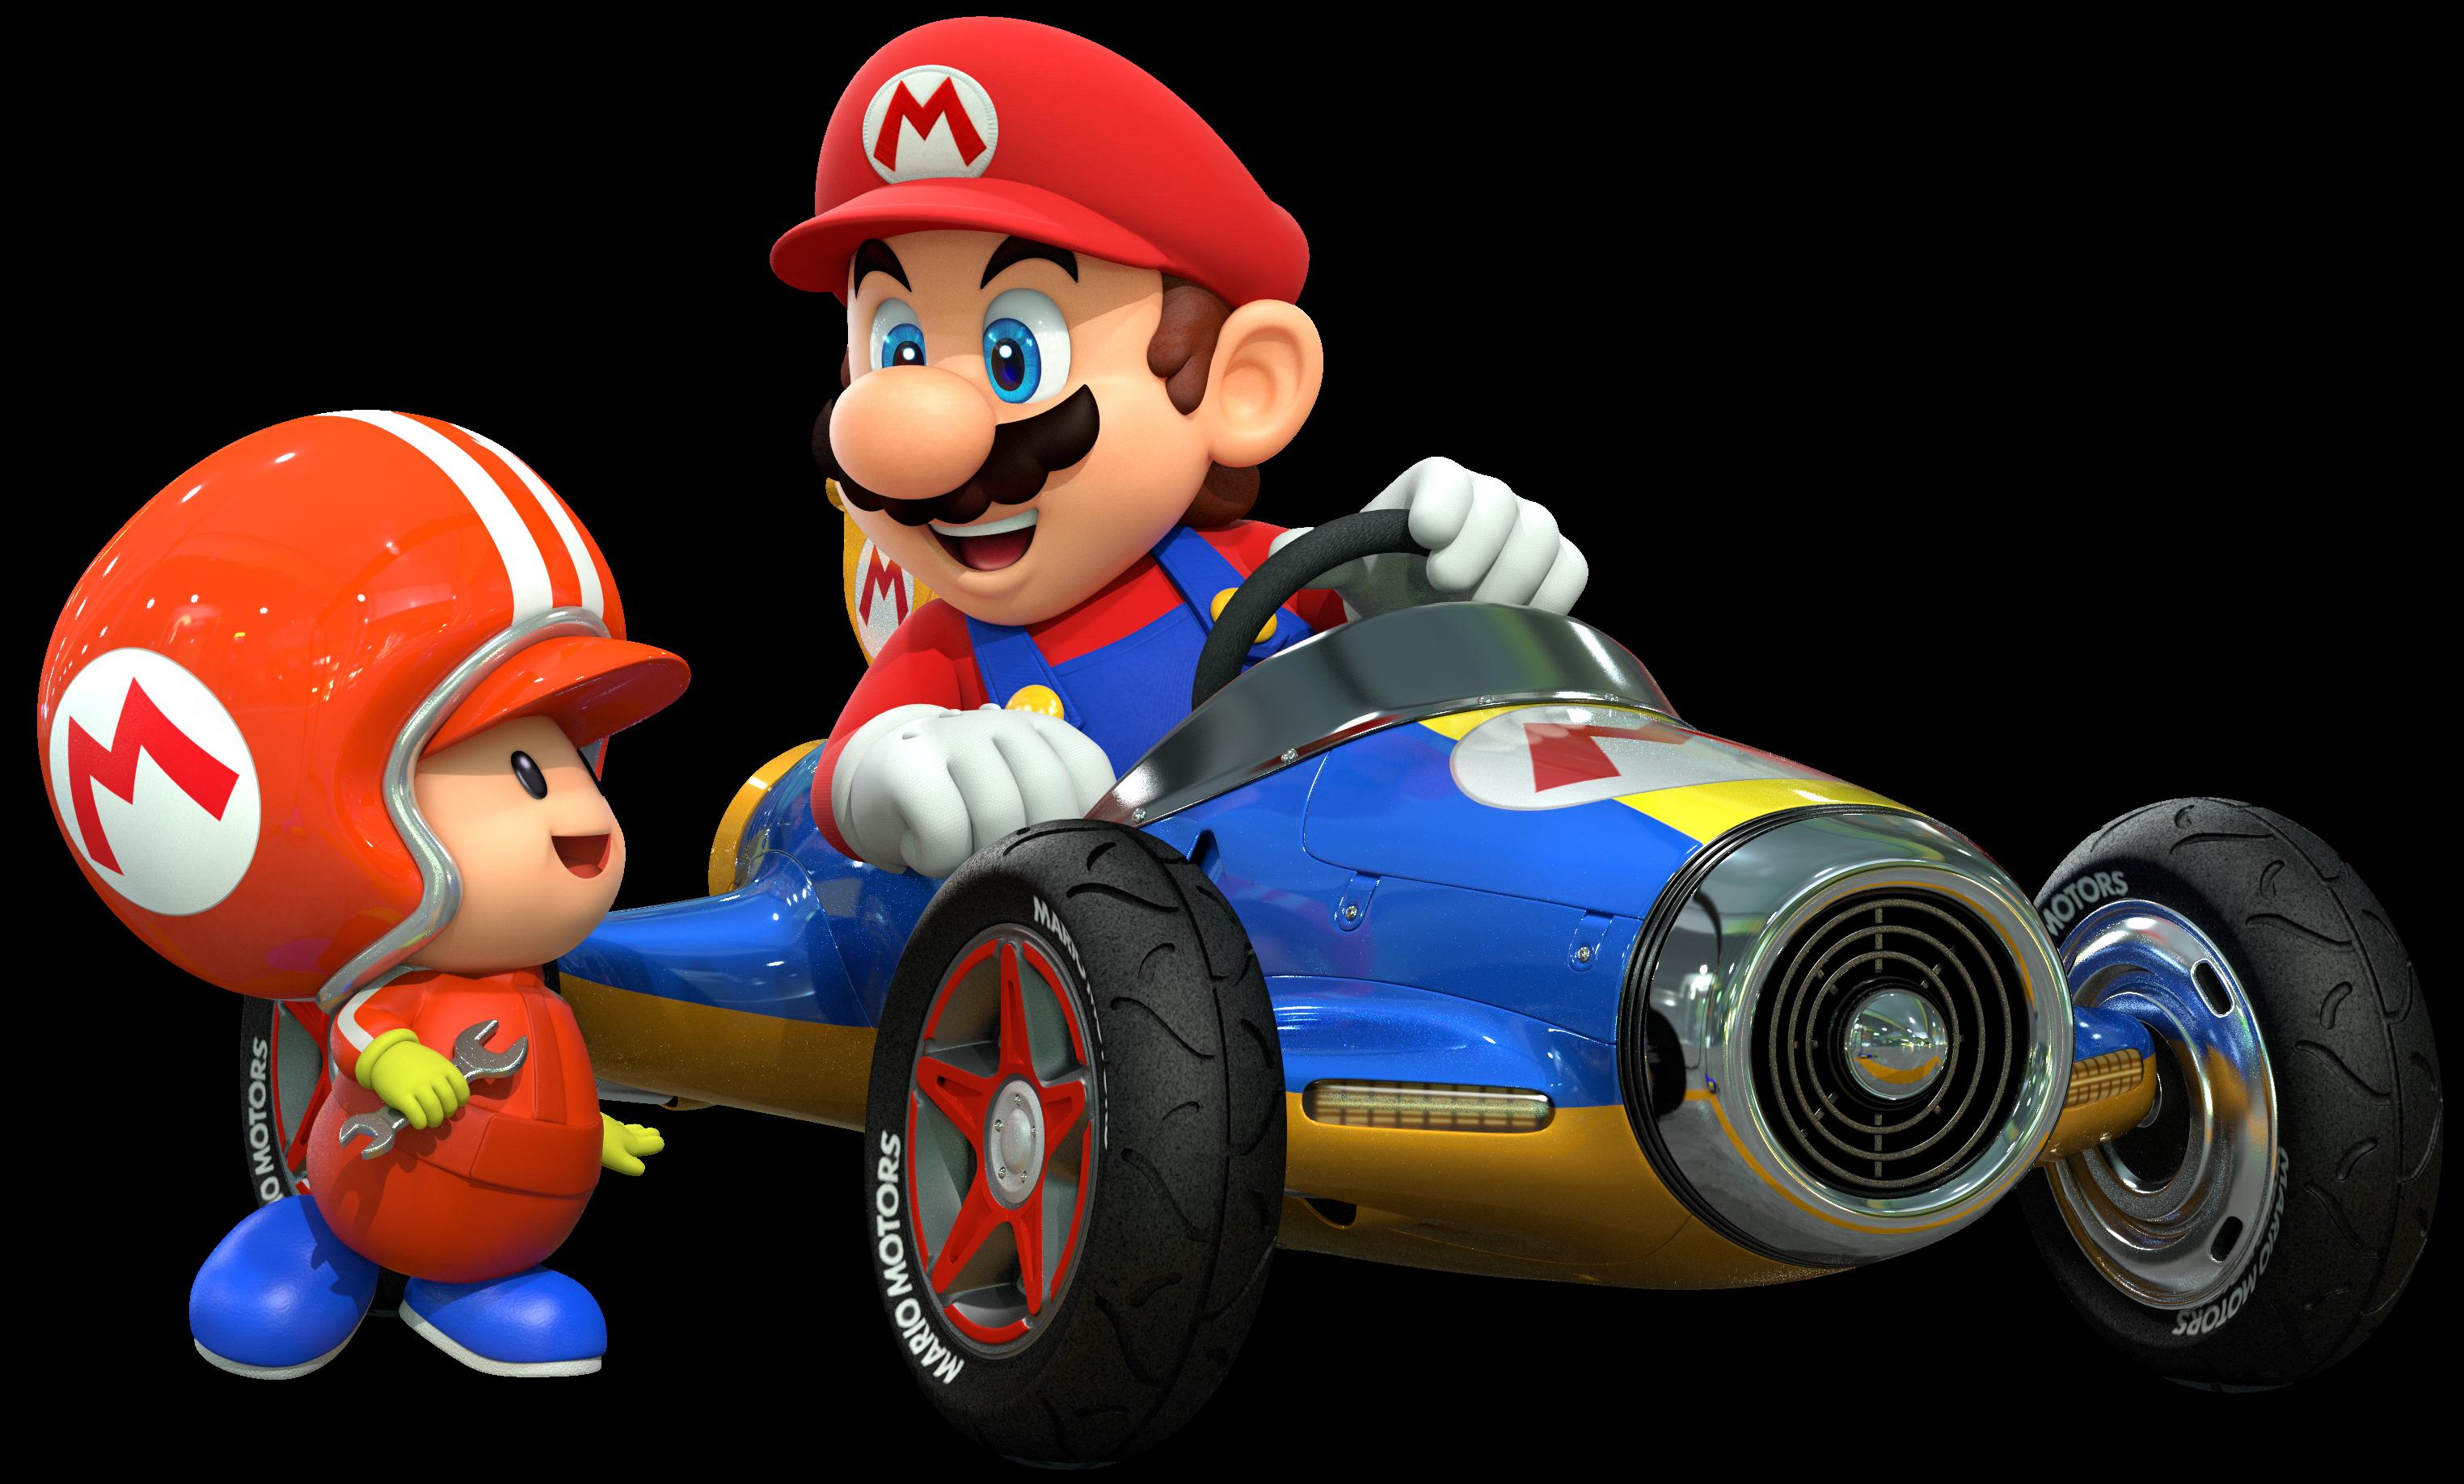 ... Mario Kart 8 (shadowless).png - Super Mario Wiki, the Mario